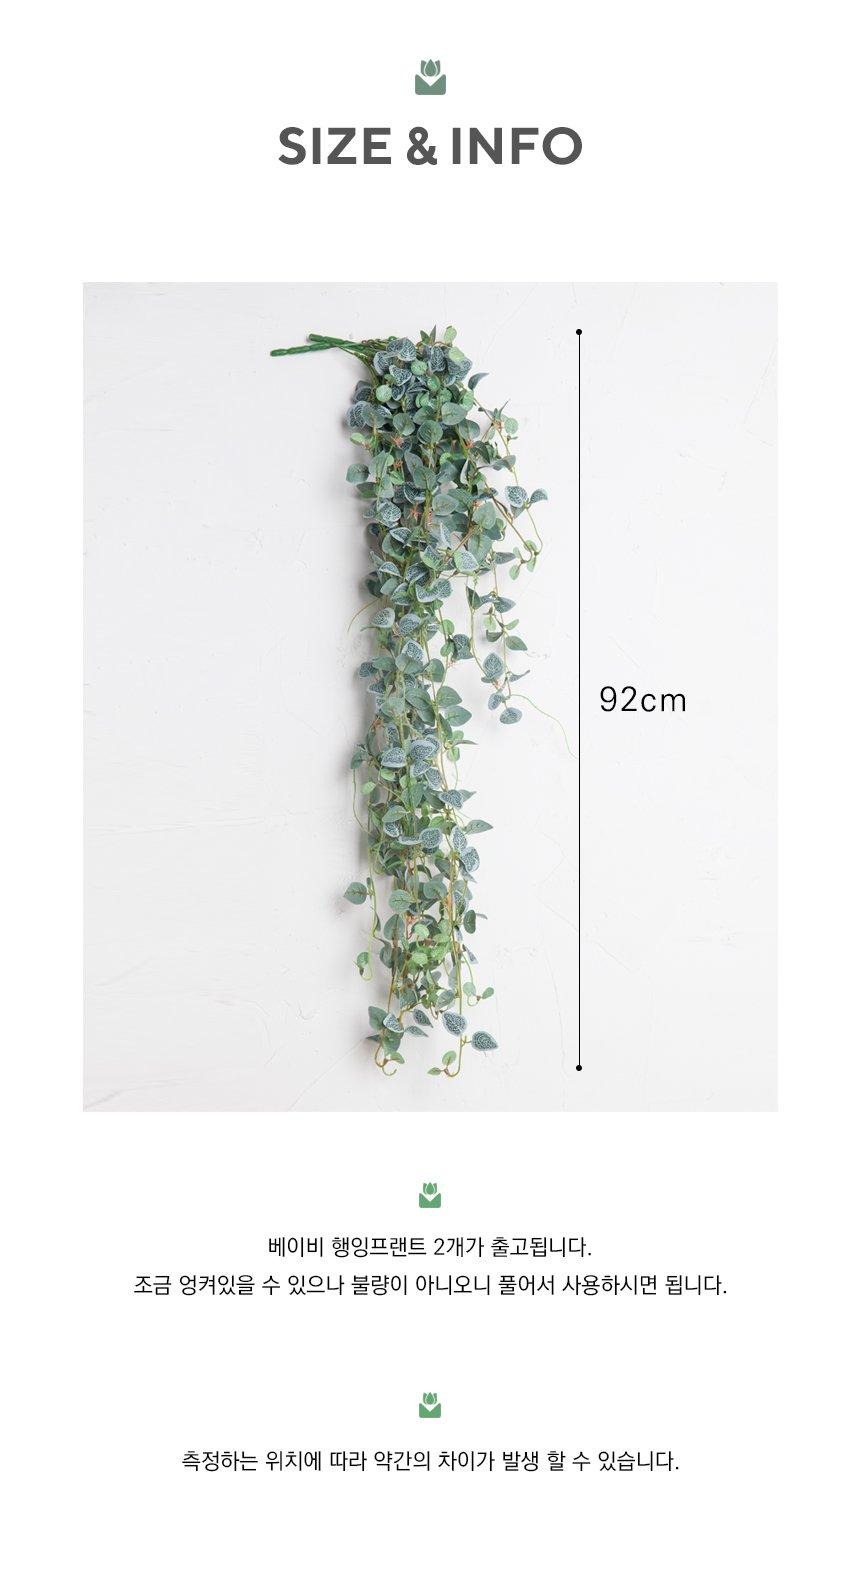 BABY-HANGING-PLANT_12.jpg